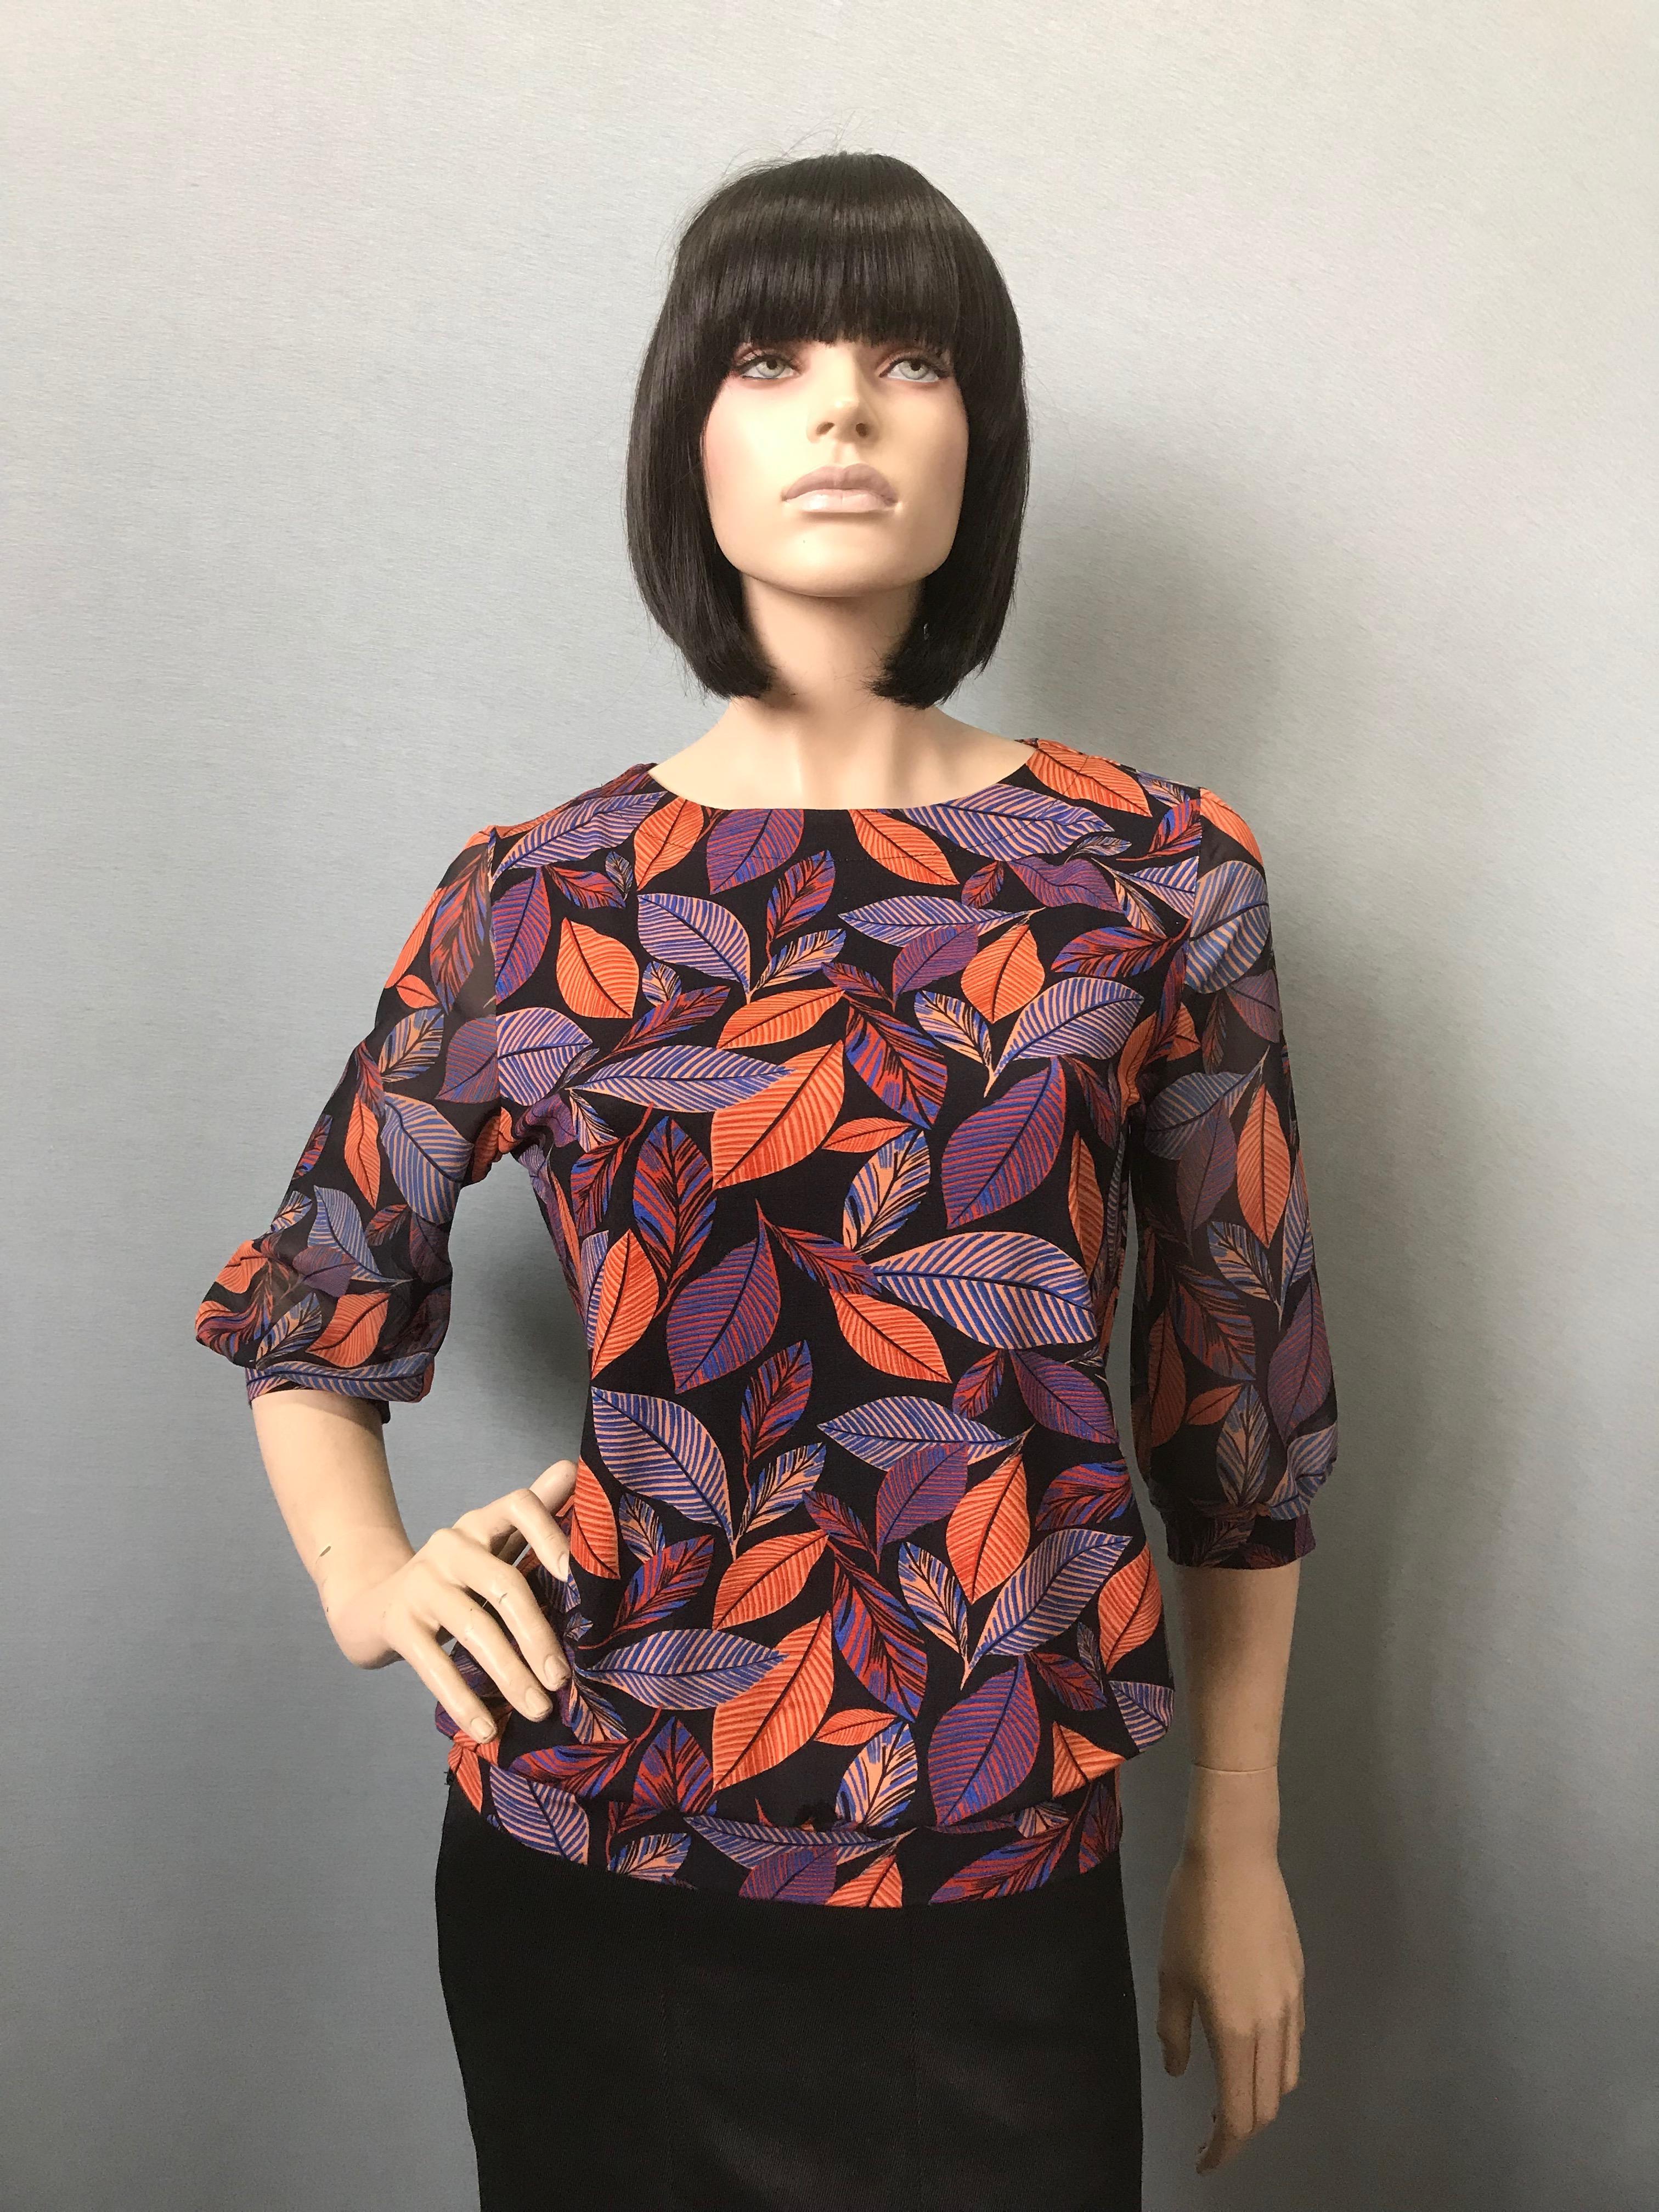 Фото блузка, состав вискоза и шифон, размеры 46-54, артикул 205.1-7